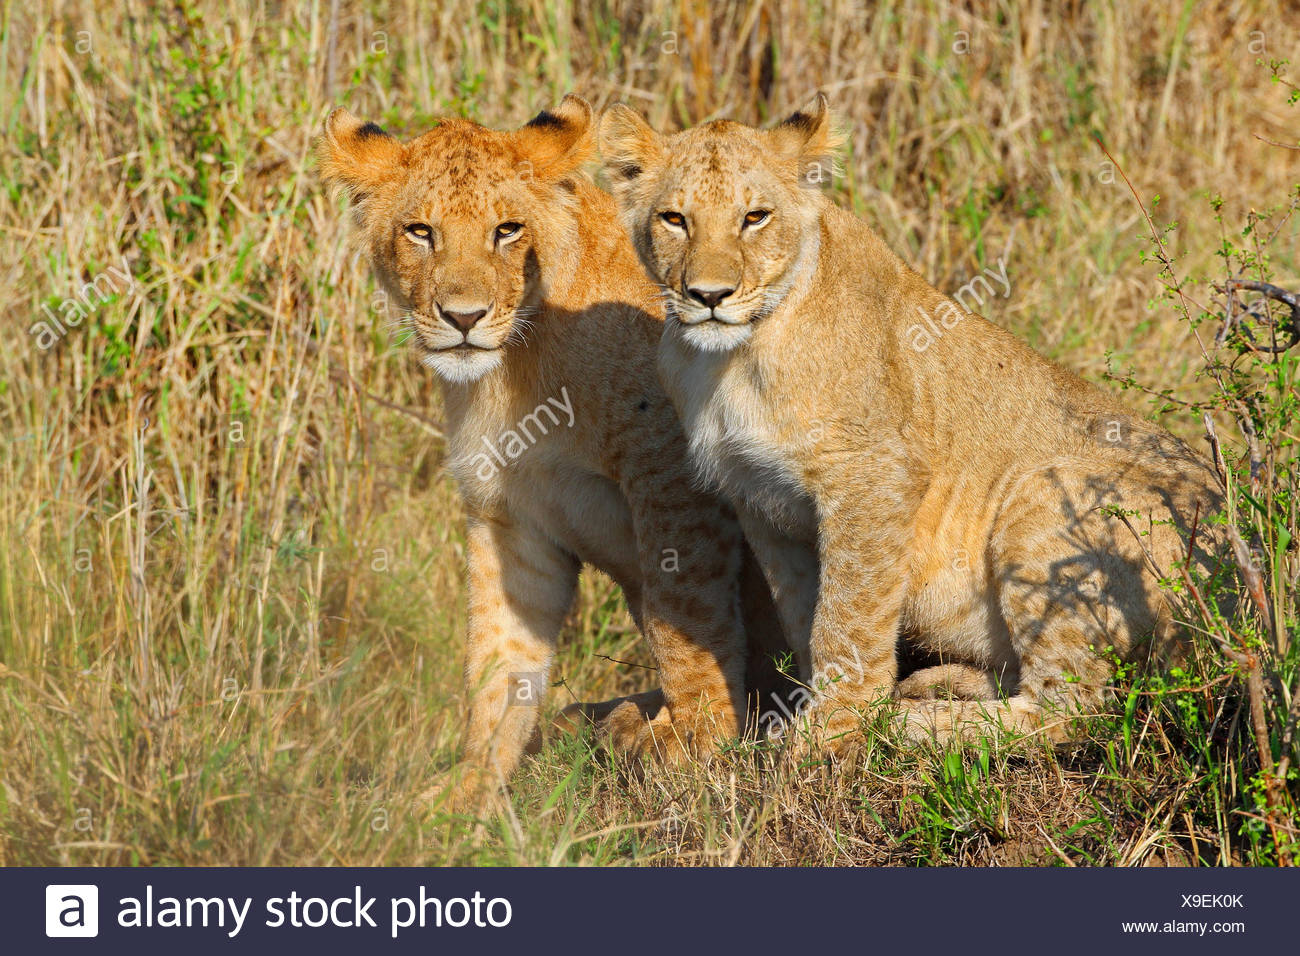 lion (Panthera leo), two cubs, Kenya, Masai Mara National Park - Stock Image